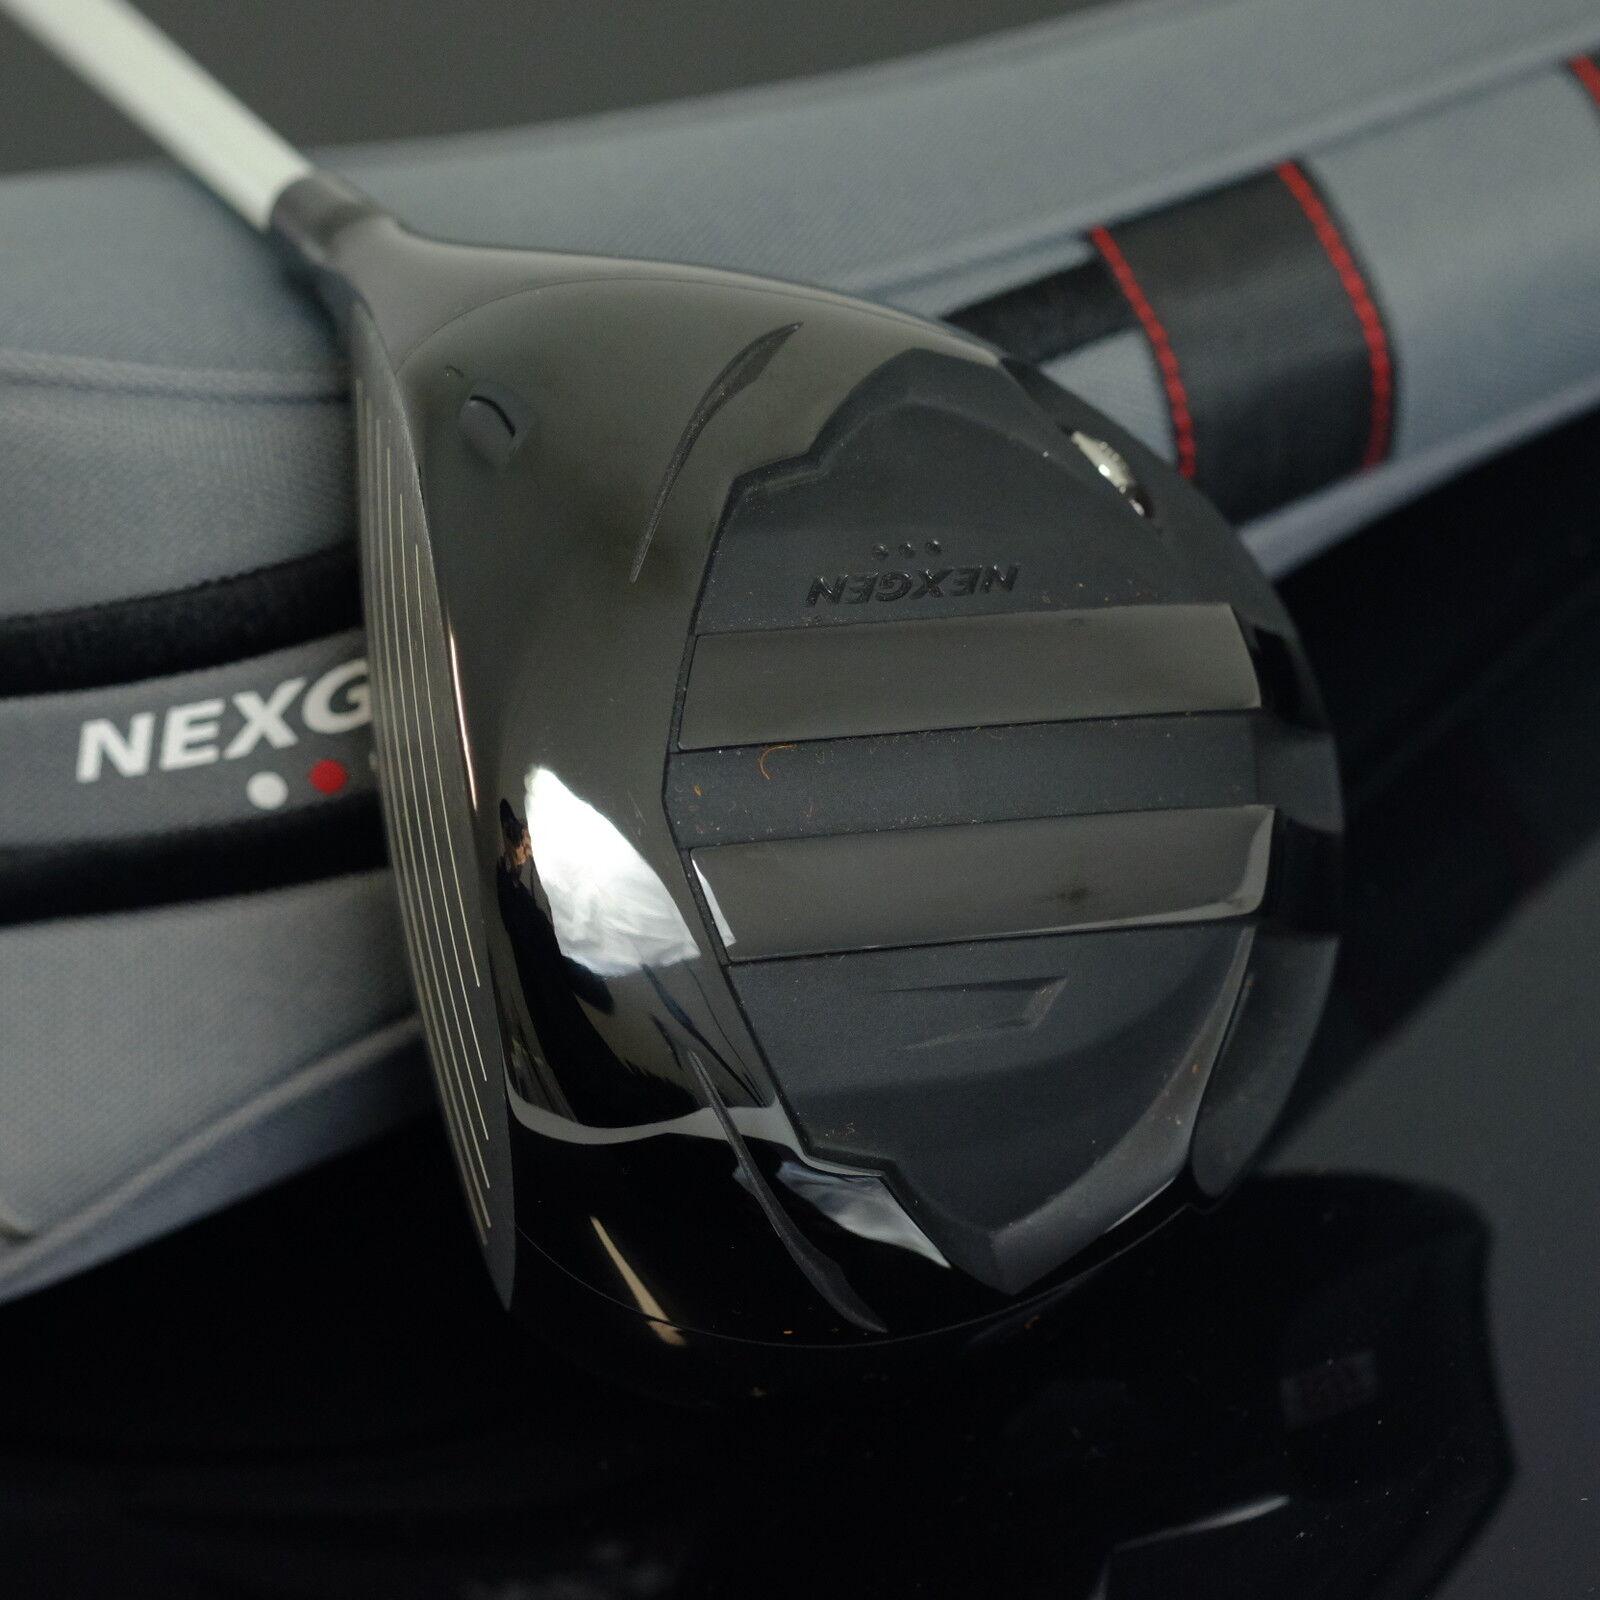 GP NexGen Jet Negro (9.5) Nspro regio Fórmula Tipo S55 (s)  280621000